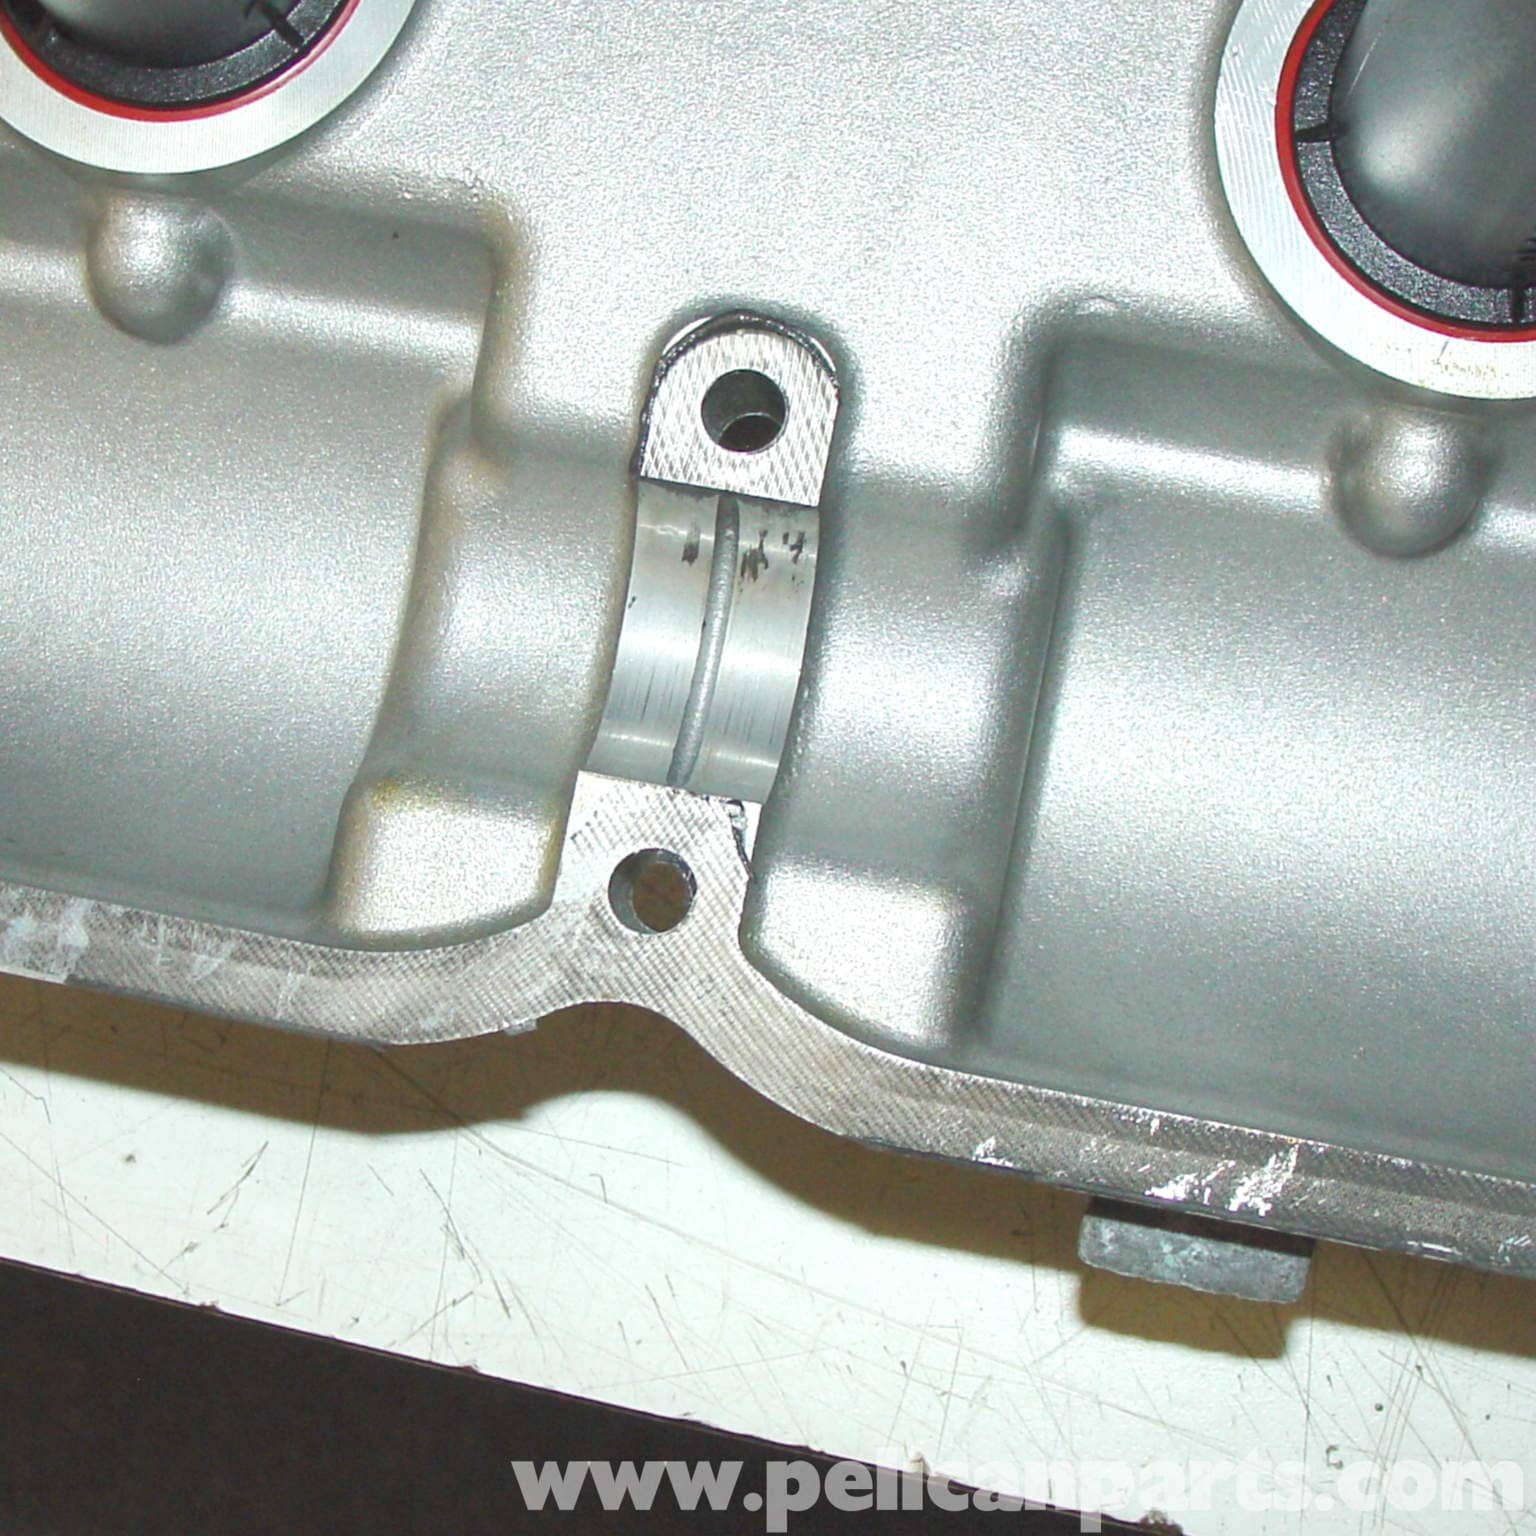 Porsche 911 Engine Swap: Porsche 911 Carrera Camshaft Swap And Valve Train Repair